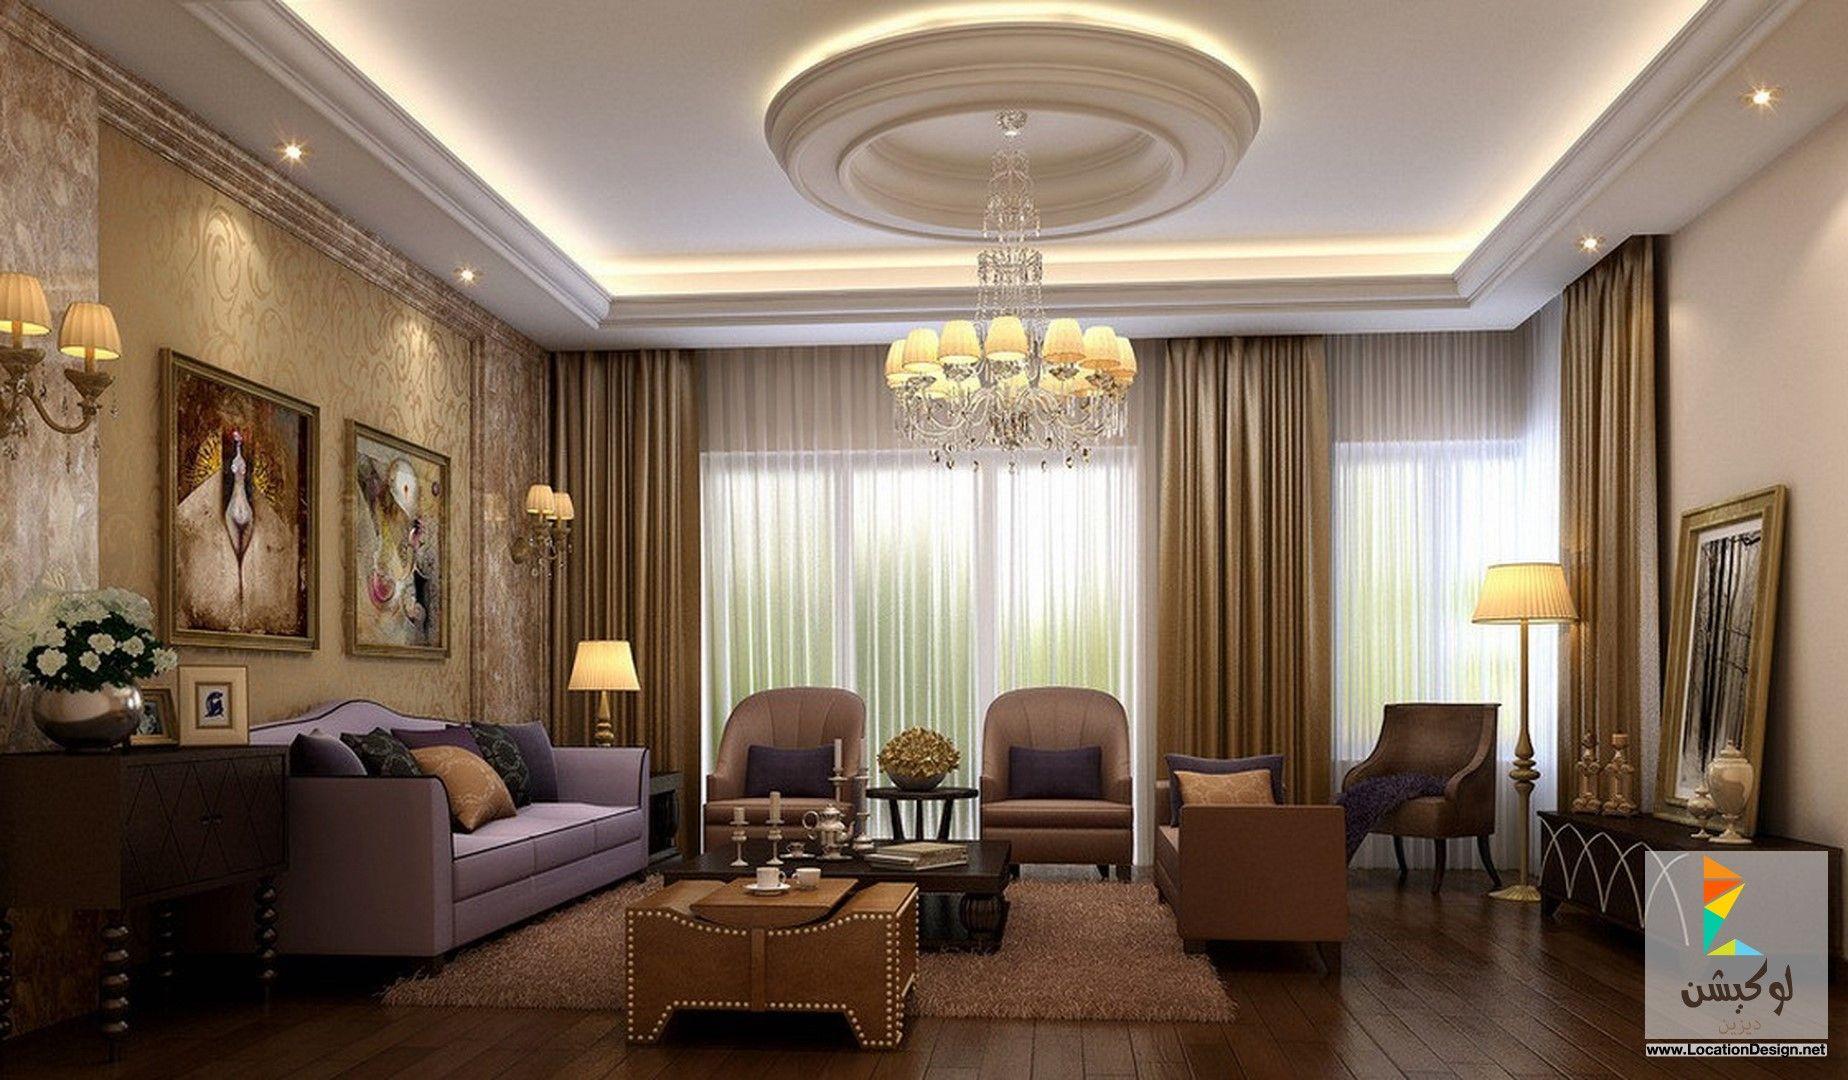 اسقف جبس بورد منازل مودرن False Ceiling Living Room Beautiful Living Rooms Decor Beautiful Living Rooms